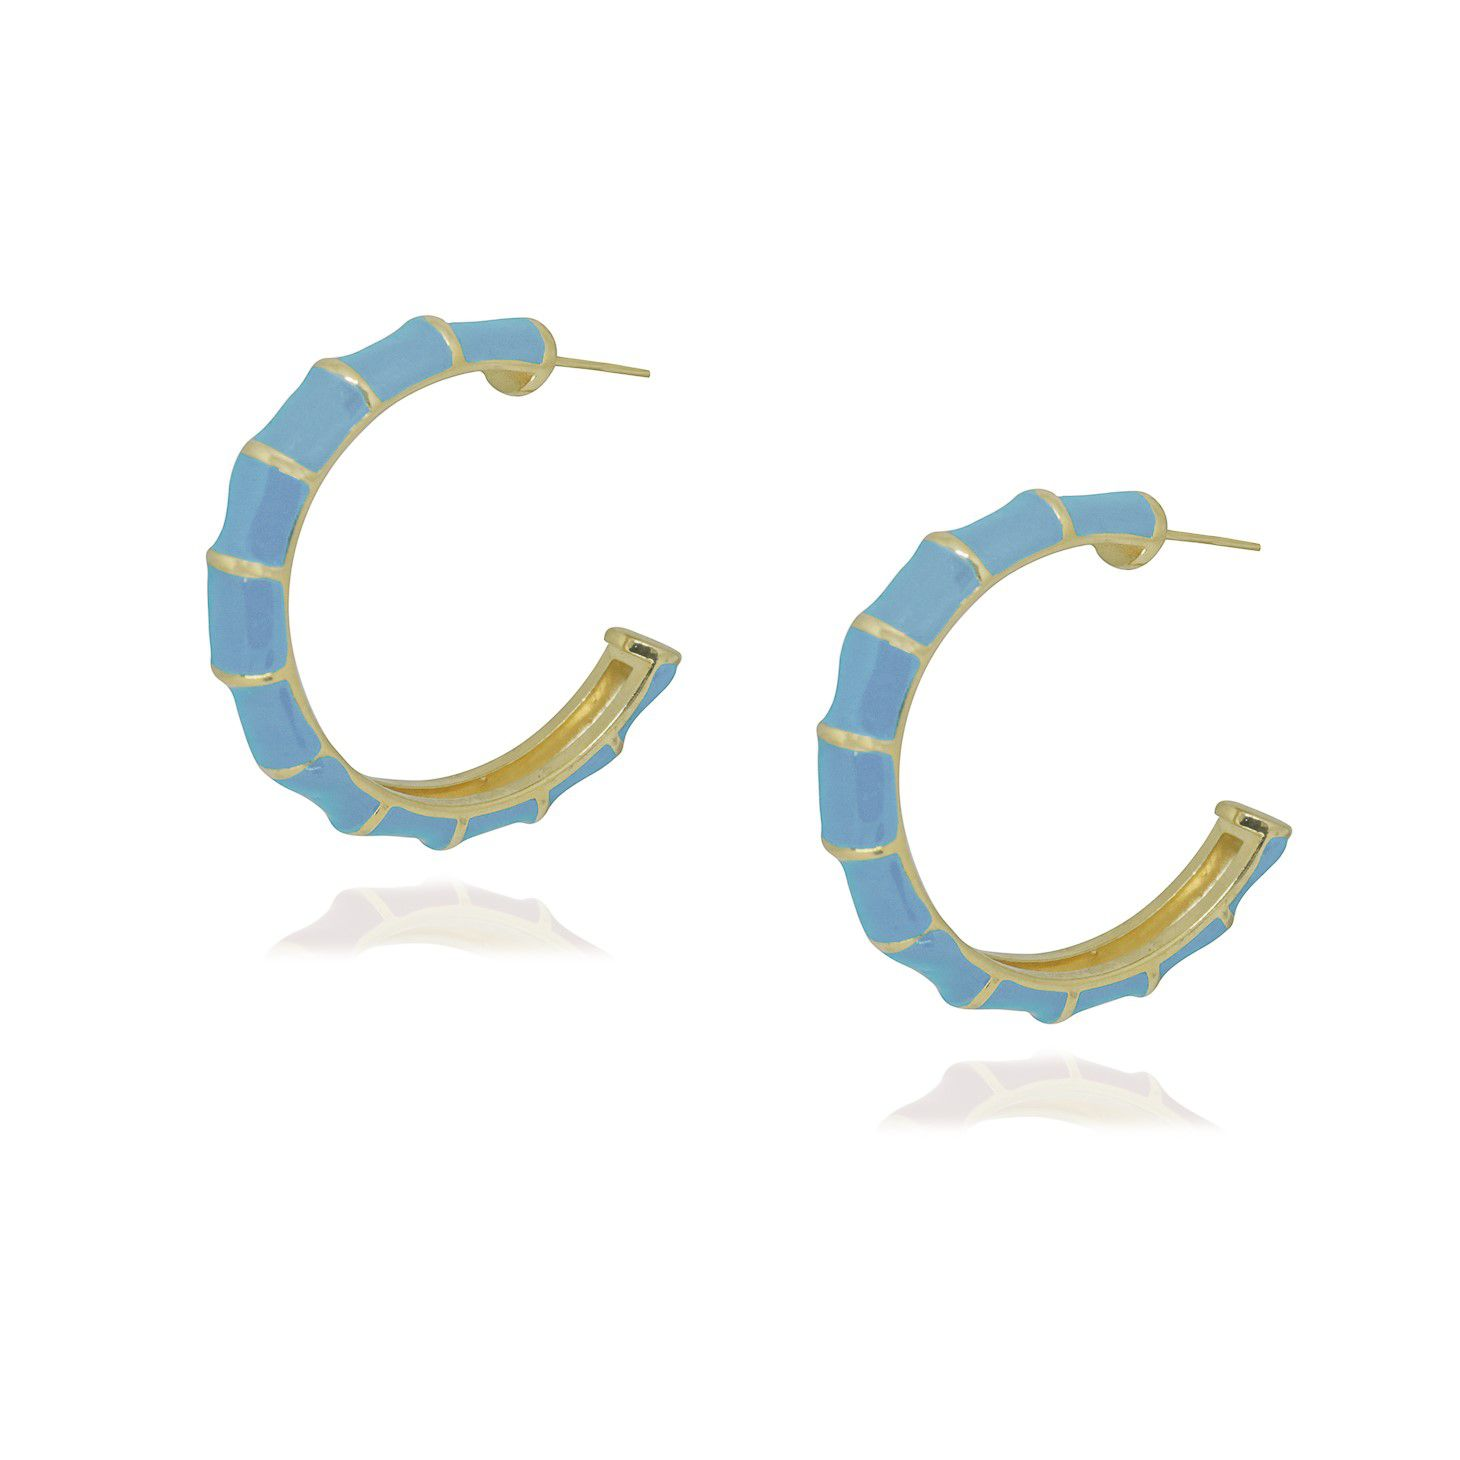 Brinco Semi joia Argola Elite Color 4 cm folheada a ouro 18k ou rhodium e resinada